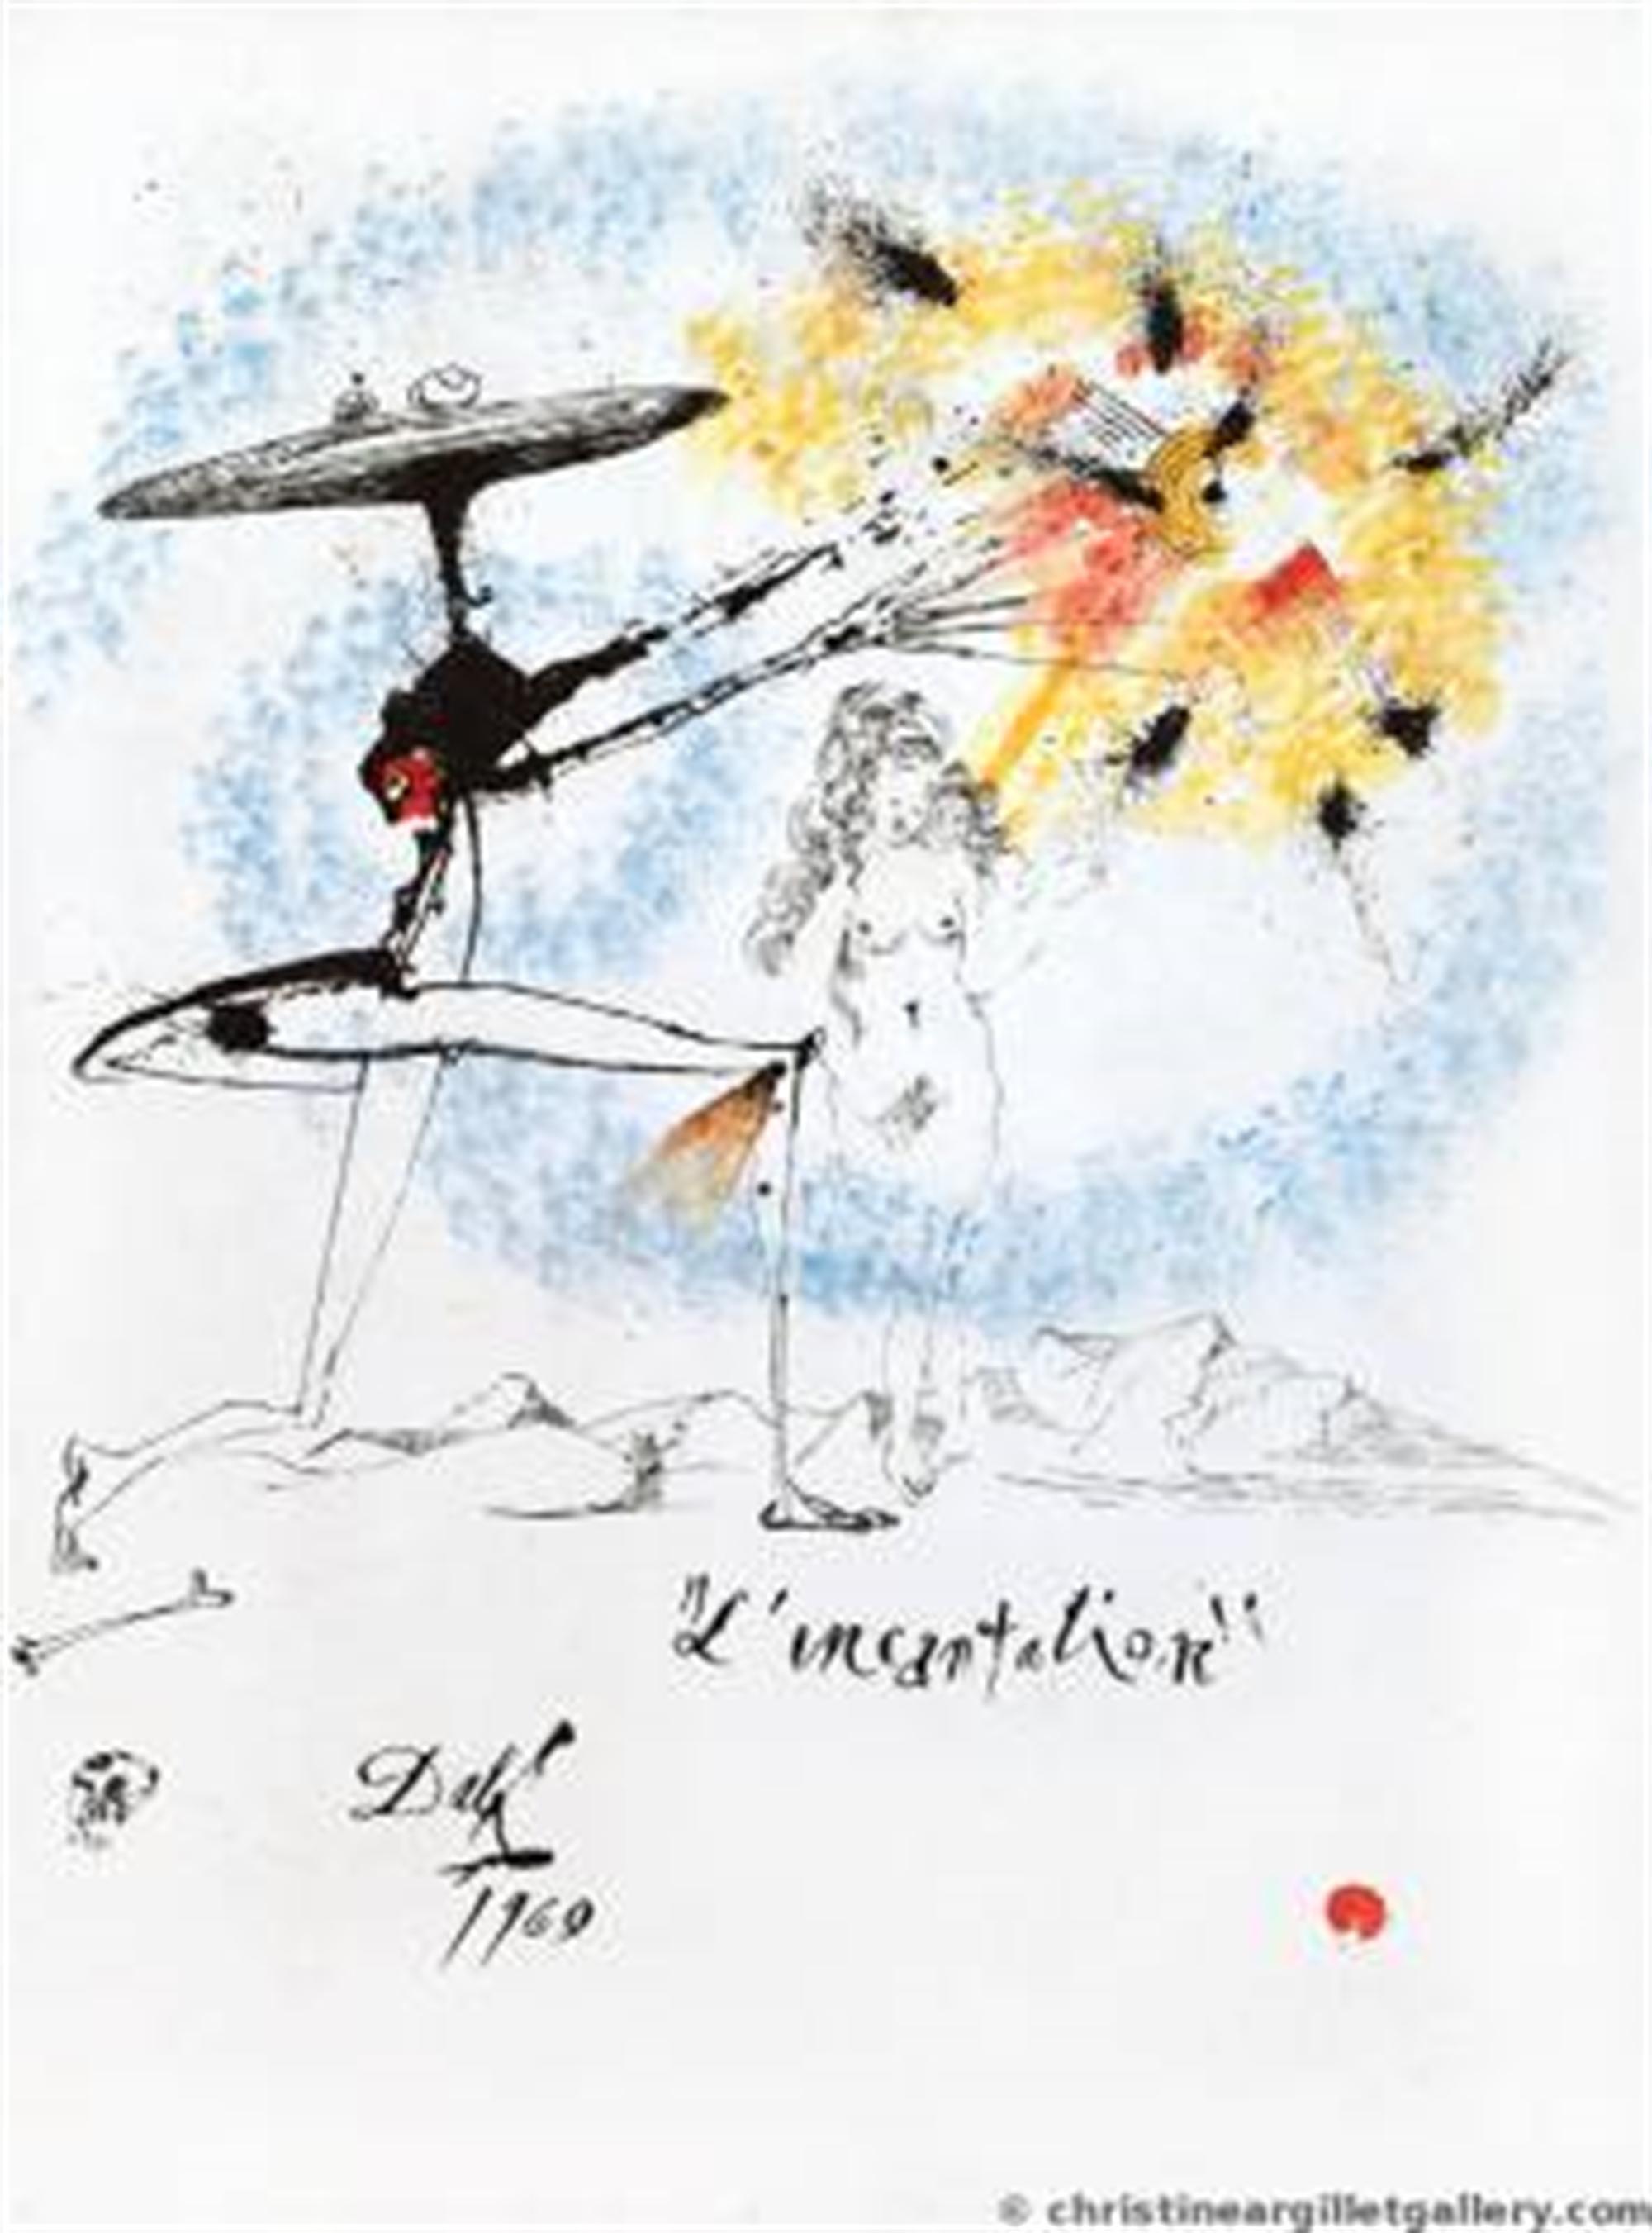 Incantation by Salvador Dali